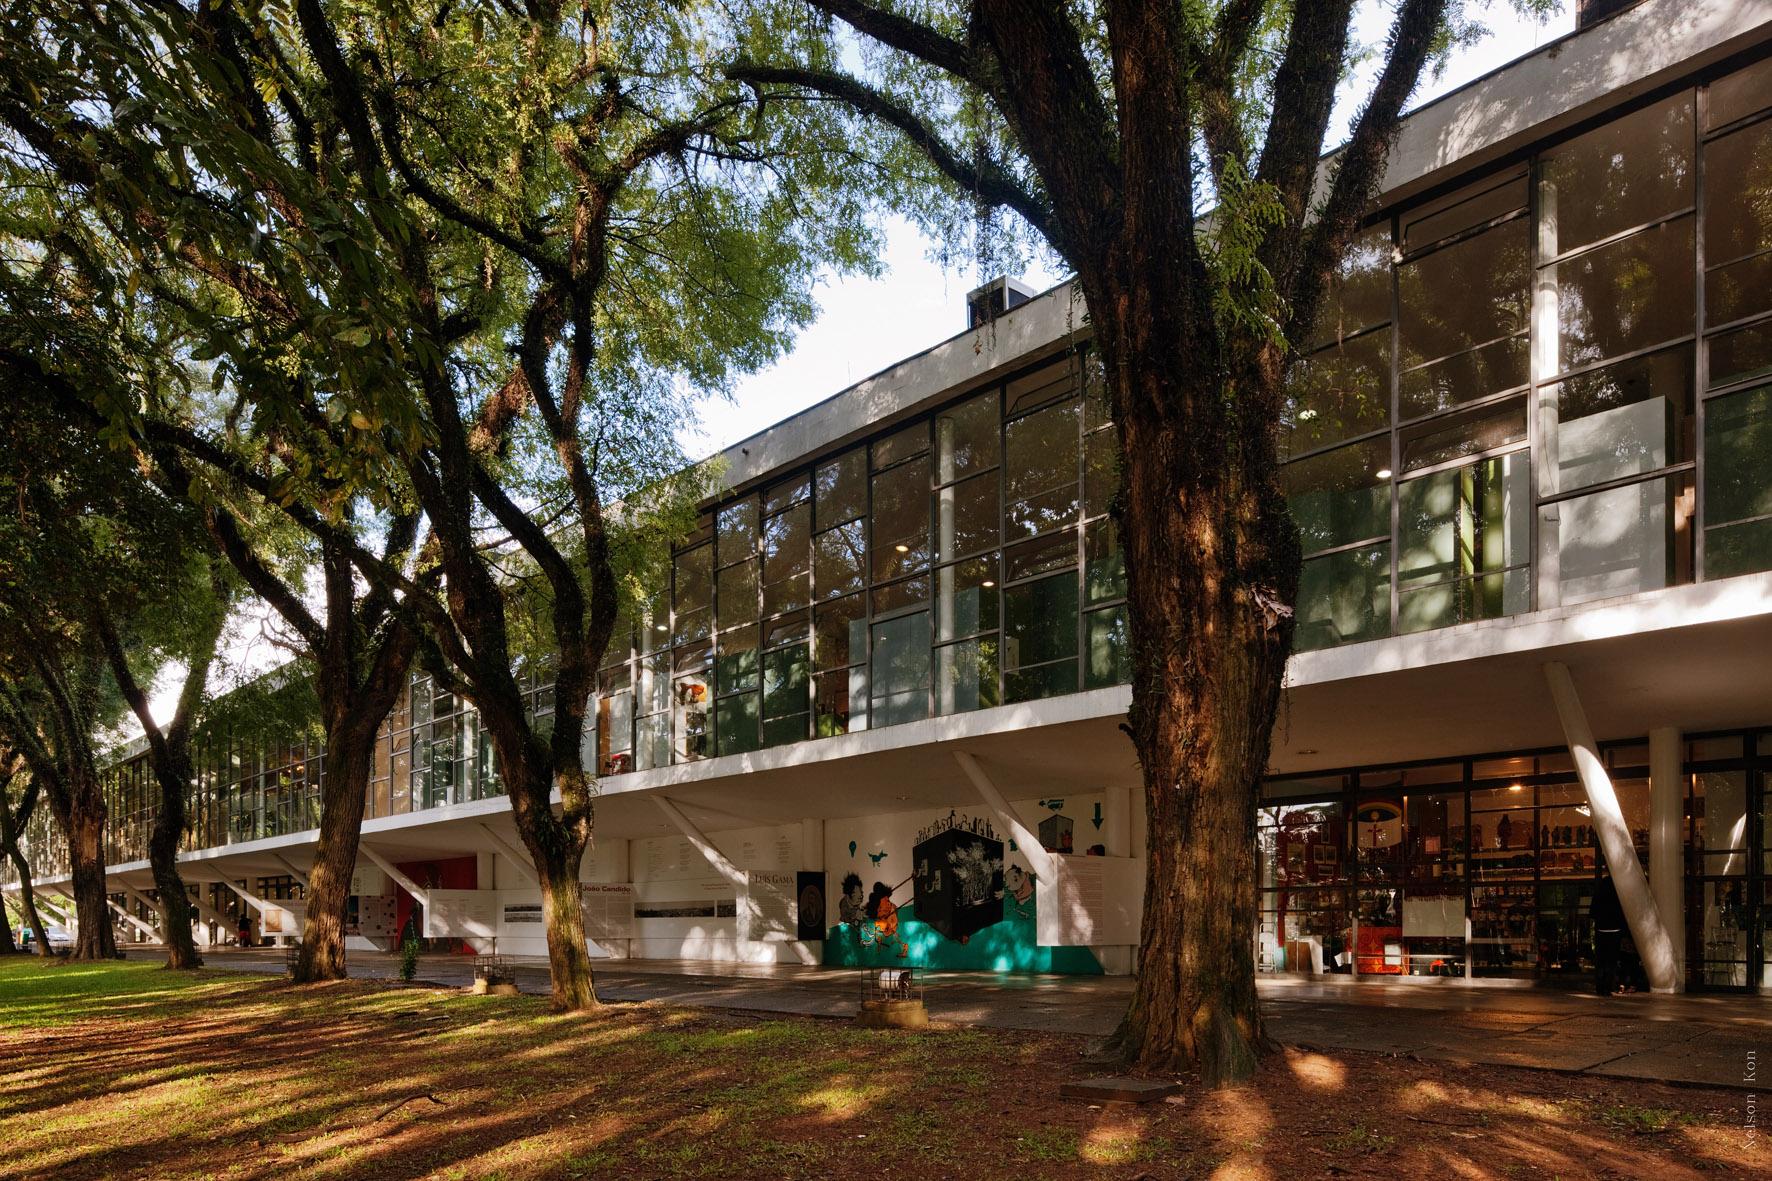 Imagem Externa - Museu Afro Brasil_– Fotos Nelson Kon